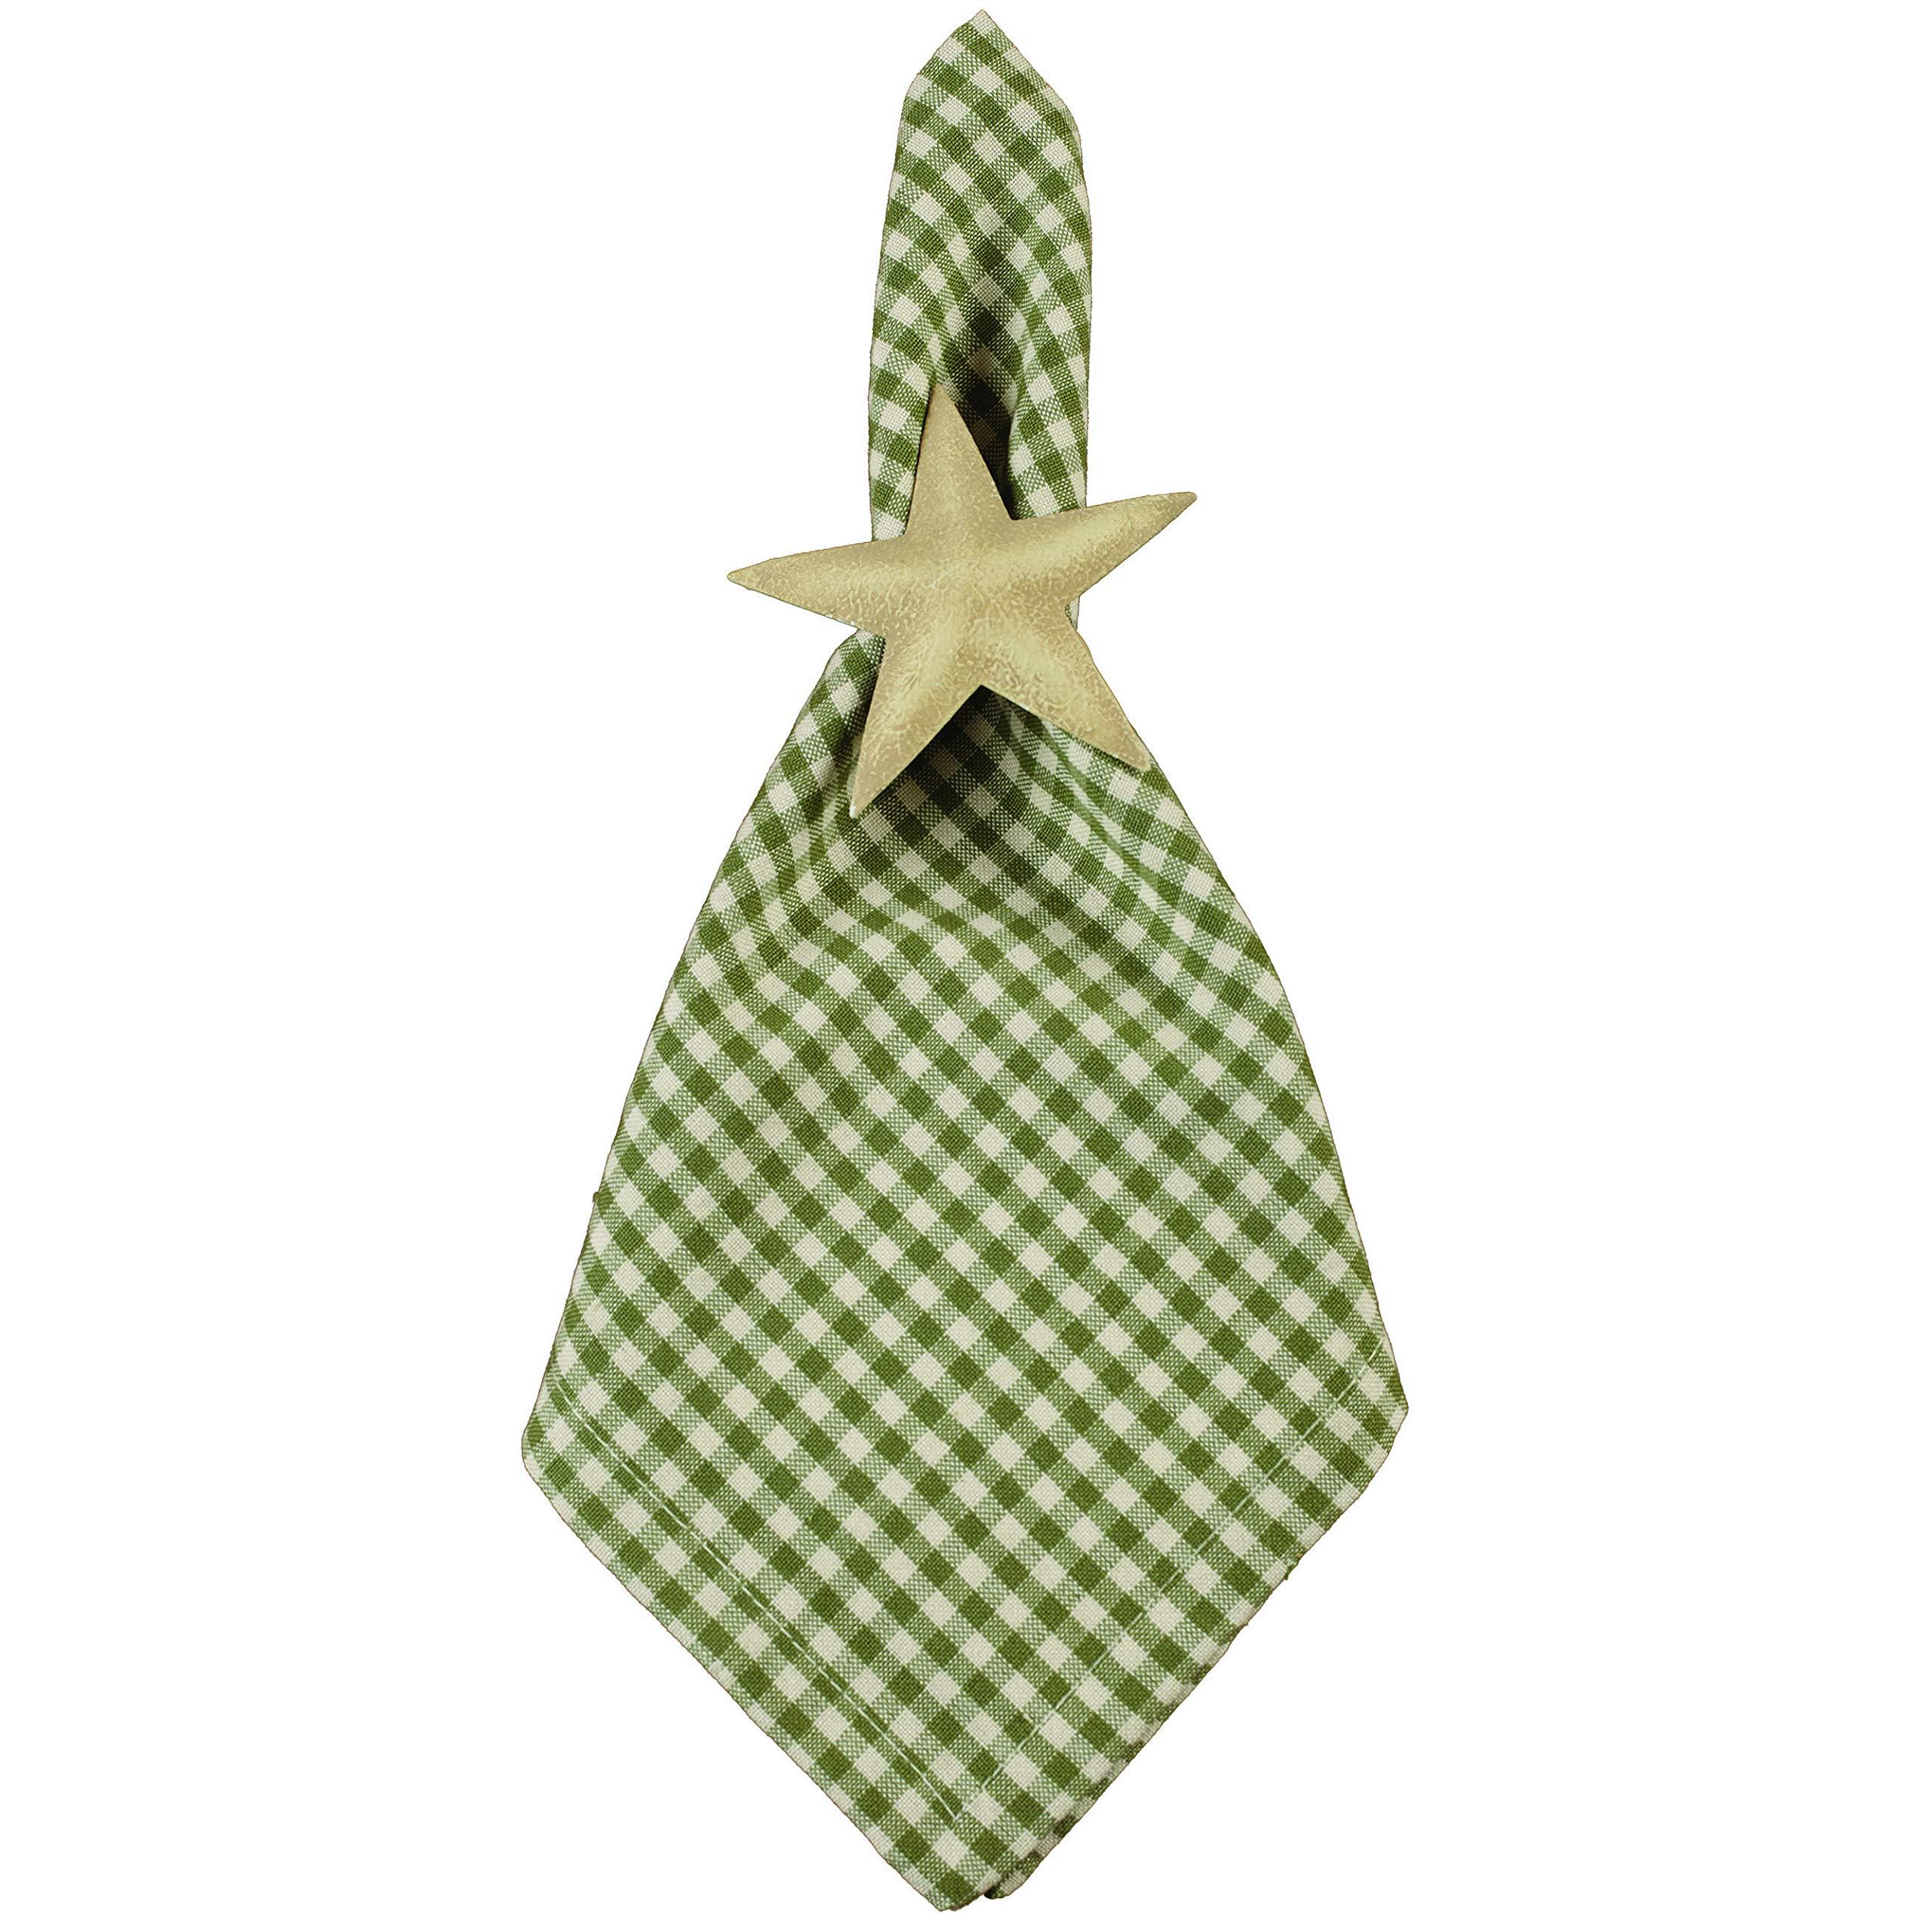 Set of 12 Plaid Country Farmhouse Sage Green Check 18 x 18 Fabric Cloth Napkins